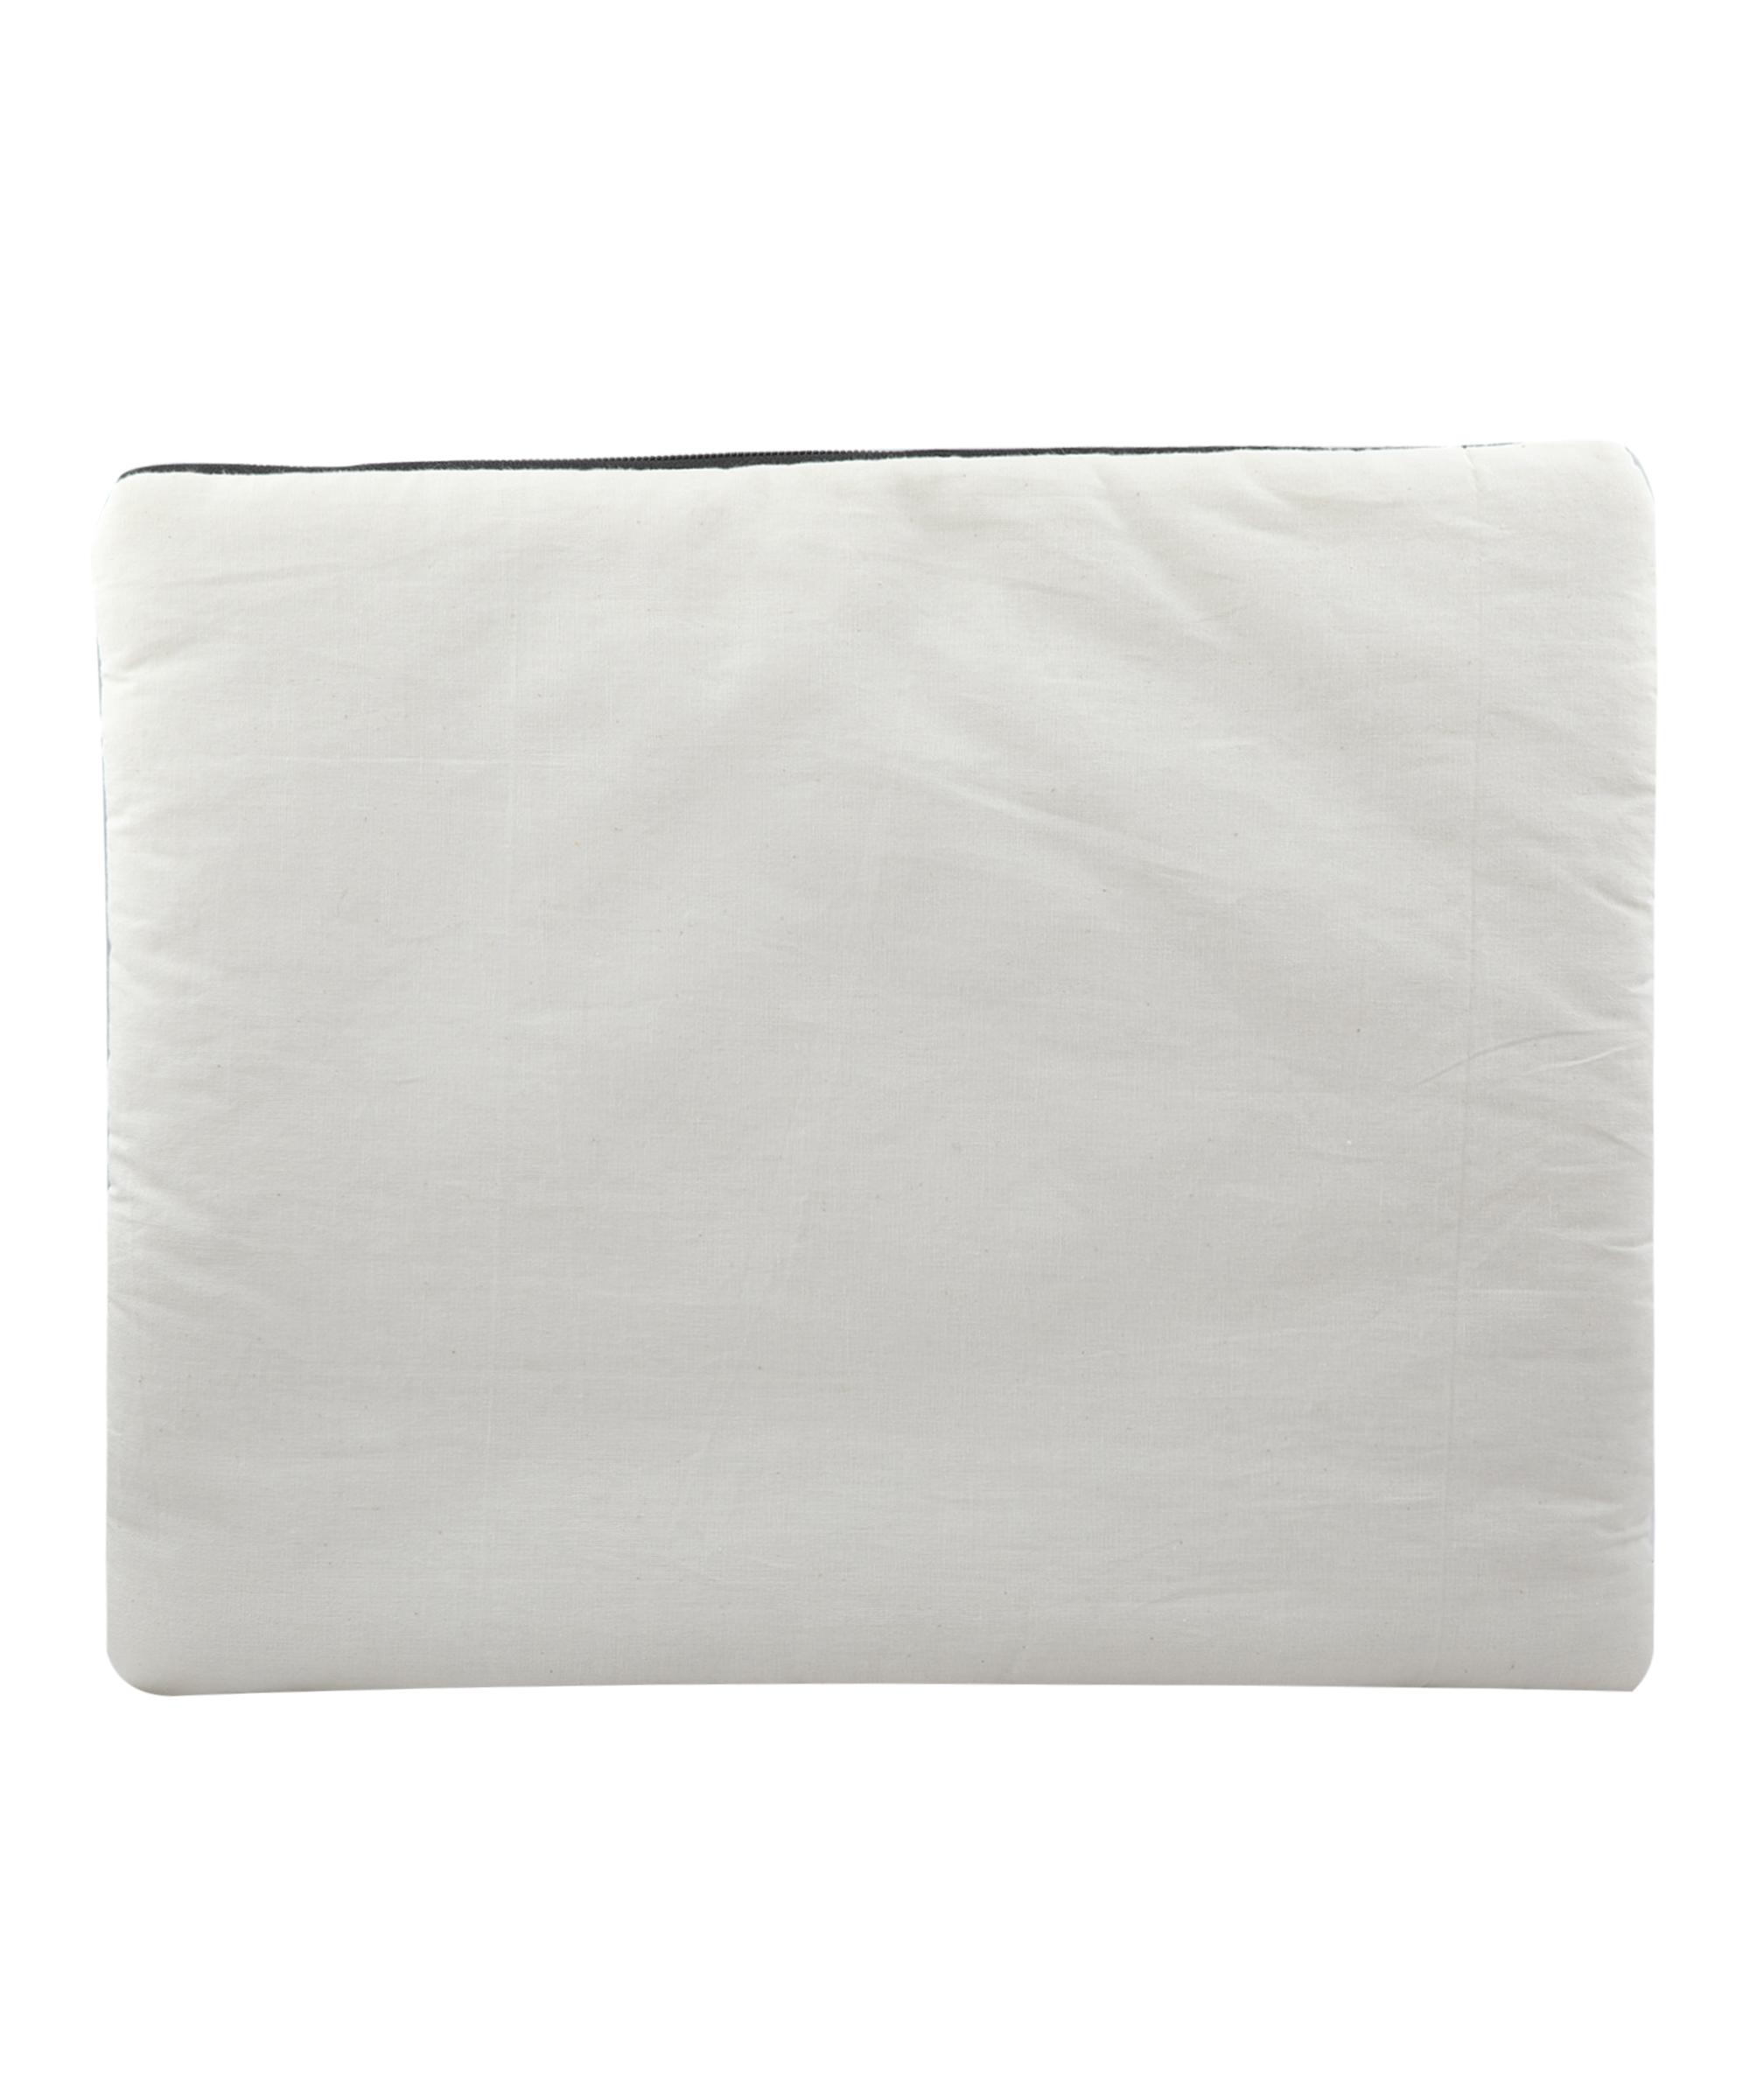 "Handmade block printed Laptop Sleeve, Kora Cotton, 16""x12"" for Laptop/Tablet/MacBook Slider Thumbnail 4/4"